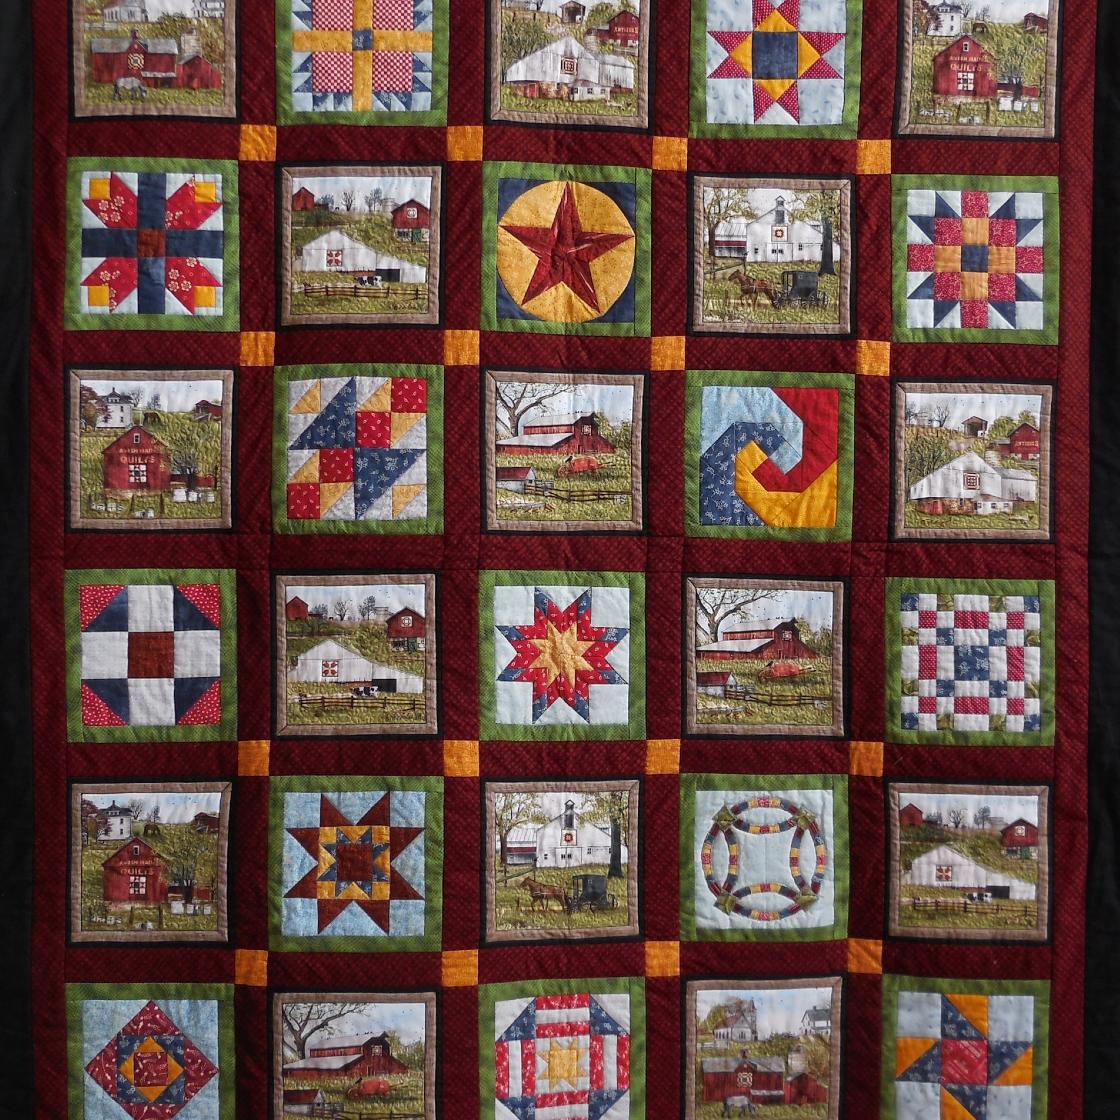 22-278 Amish Farms